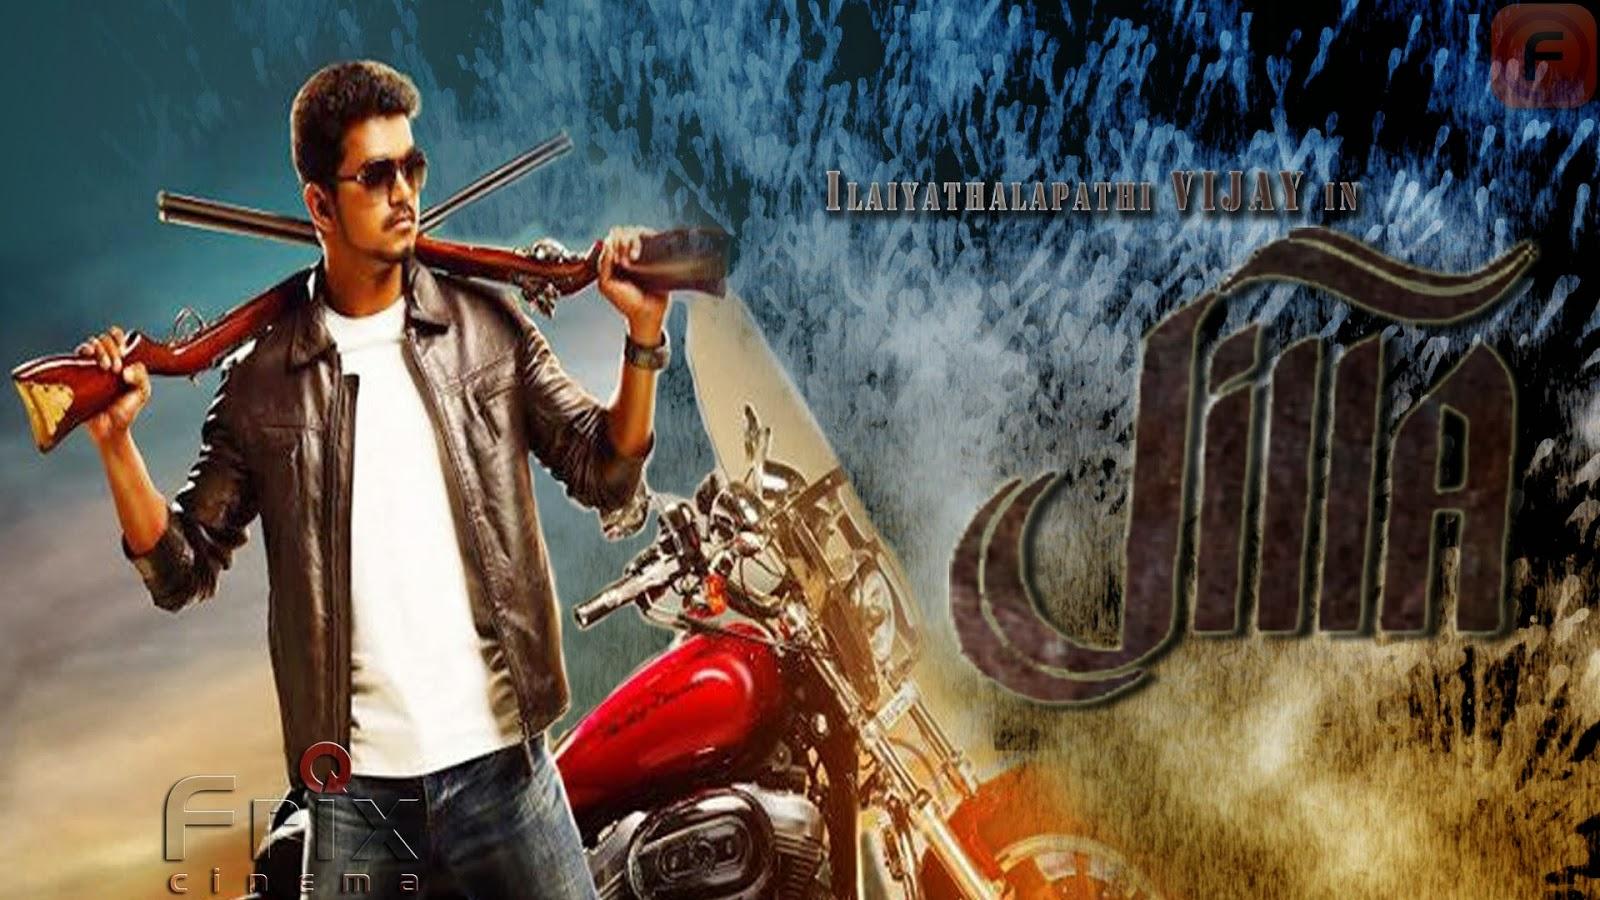 vijay jilla movie wallpapers « frix cinema